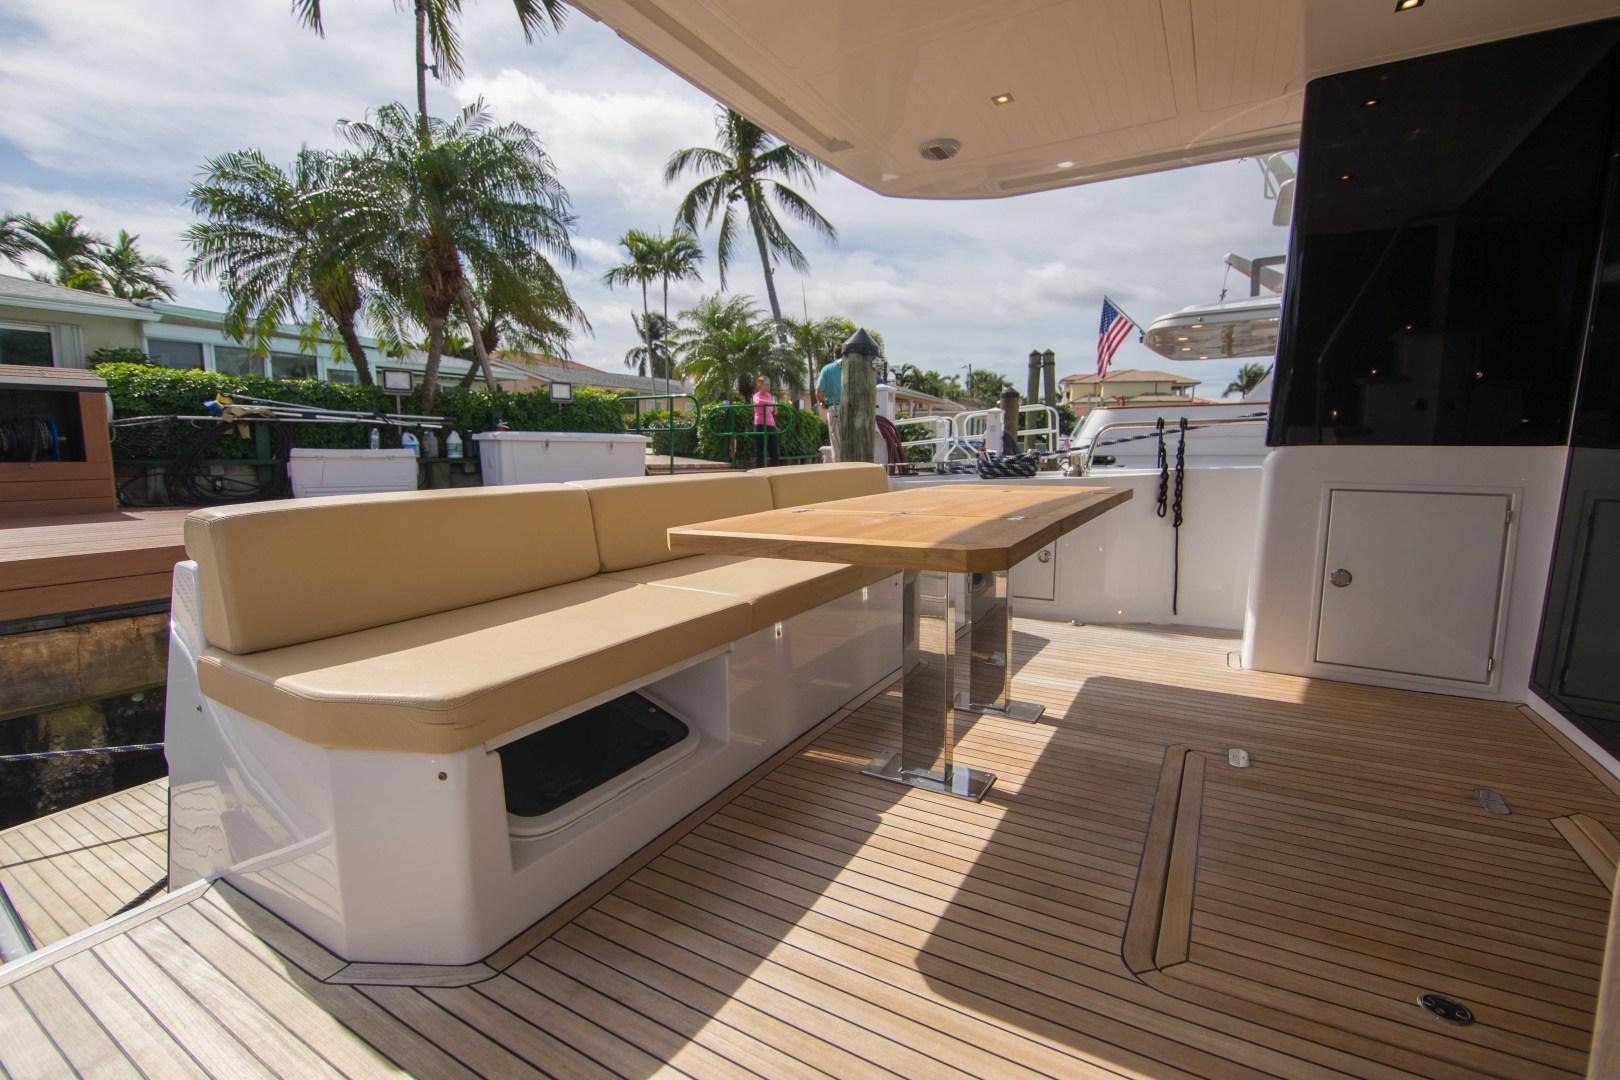 Sundeck-58 Sport 2019-LJ IV Singer Island-Florida-United States-Aft Deck-1373059 | Thumbnail